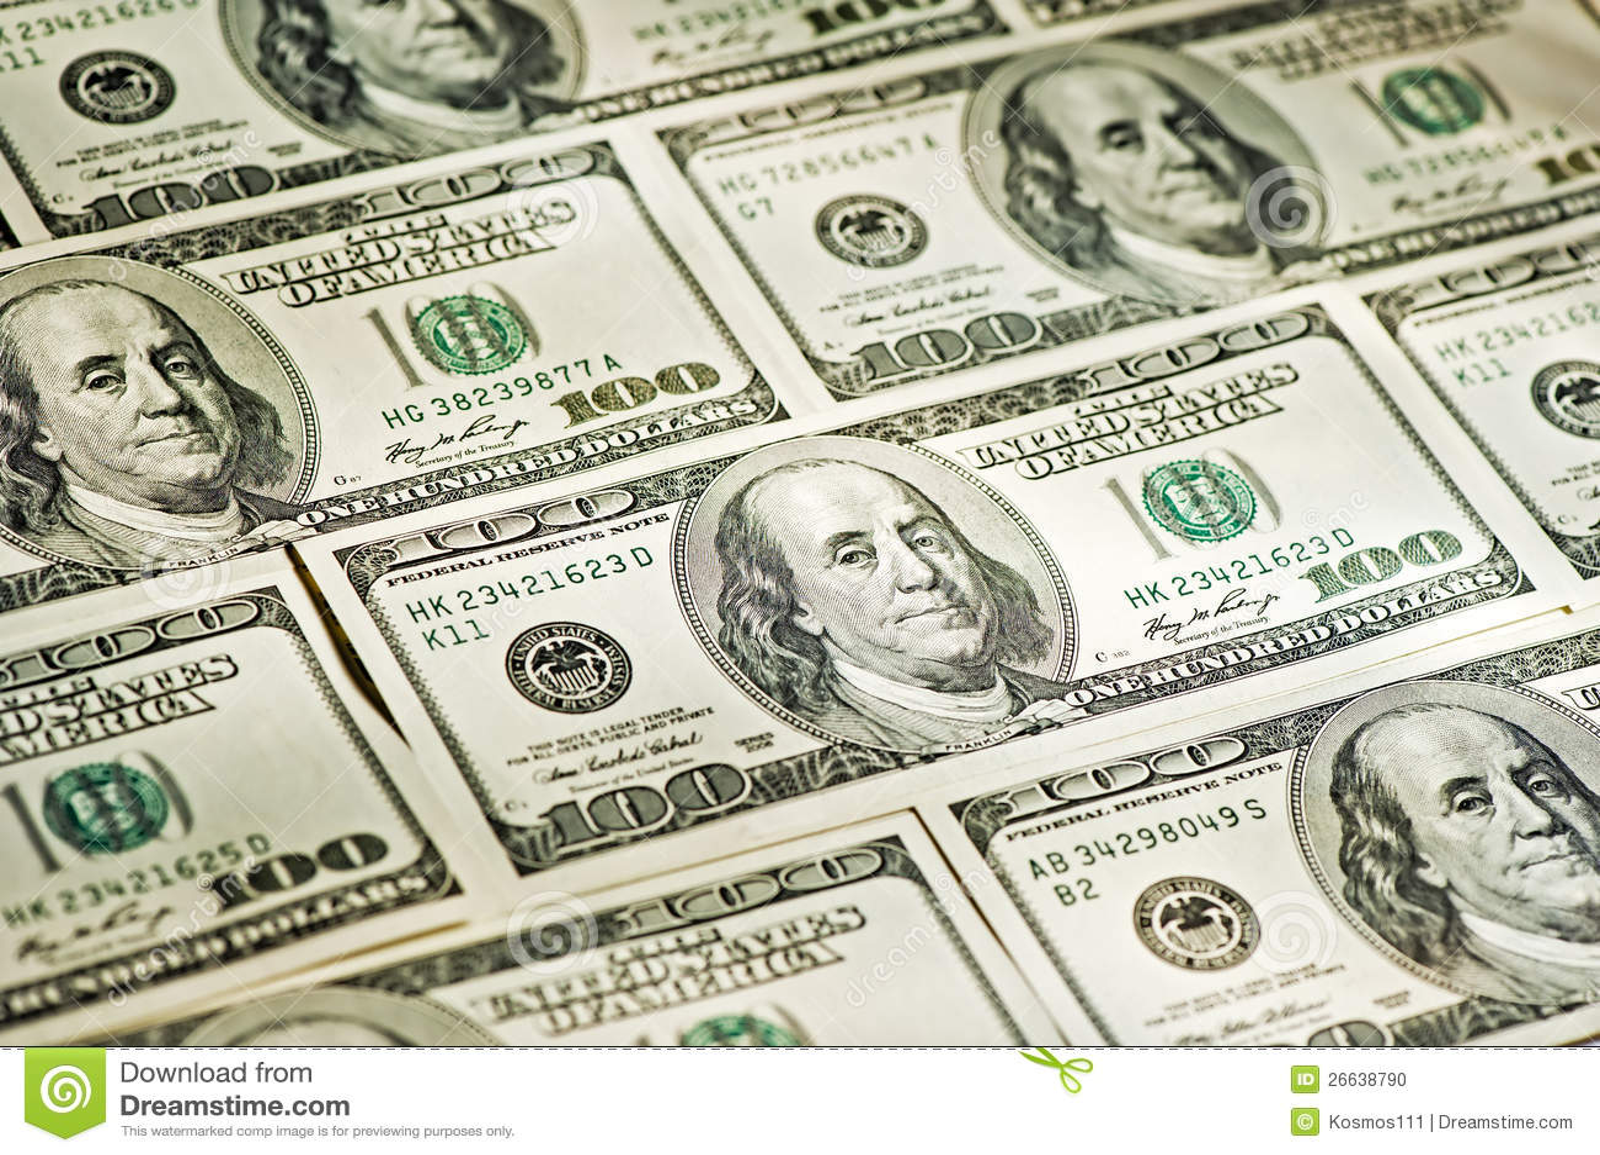 Big Money Closeup Stock Photo - Image: 26638790